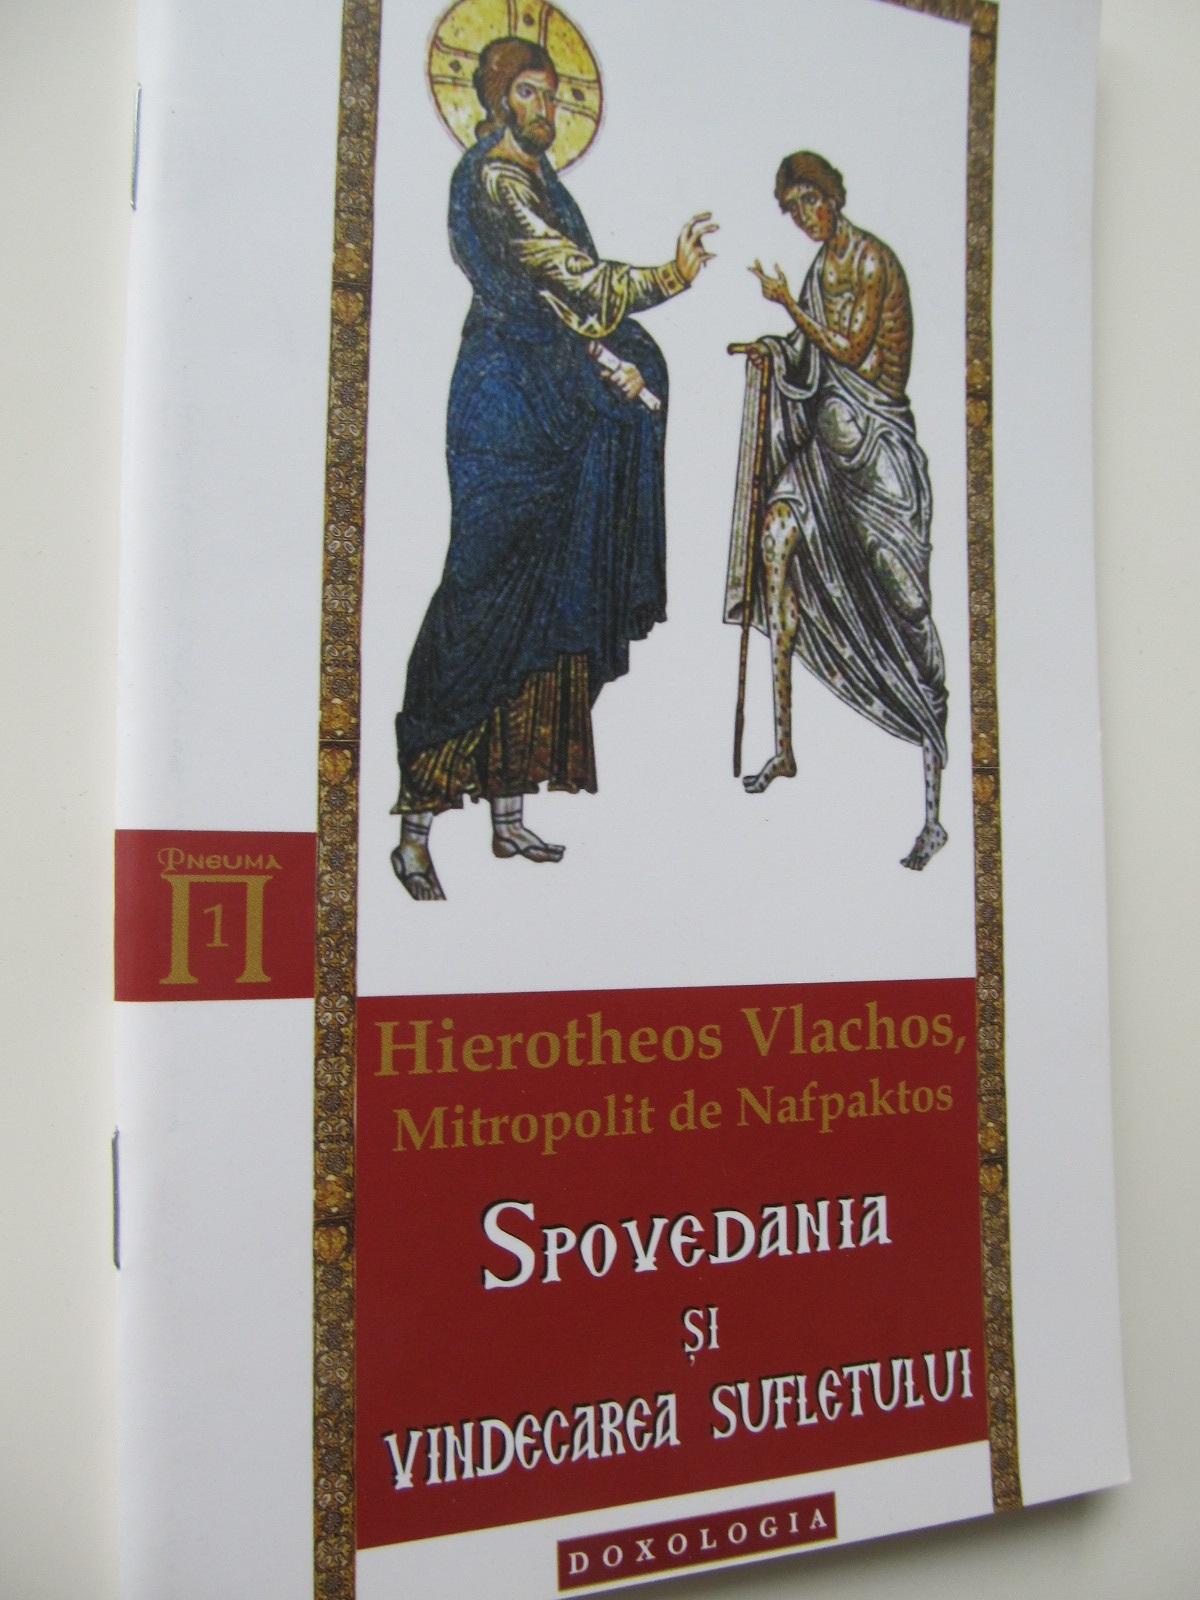 Spovedania si vindecarea sufletului - Hierotheos Vlachos | Detalii carte